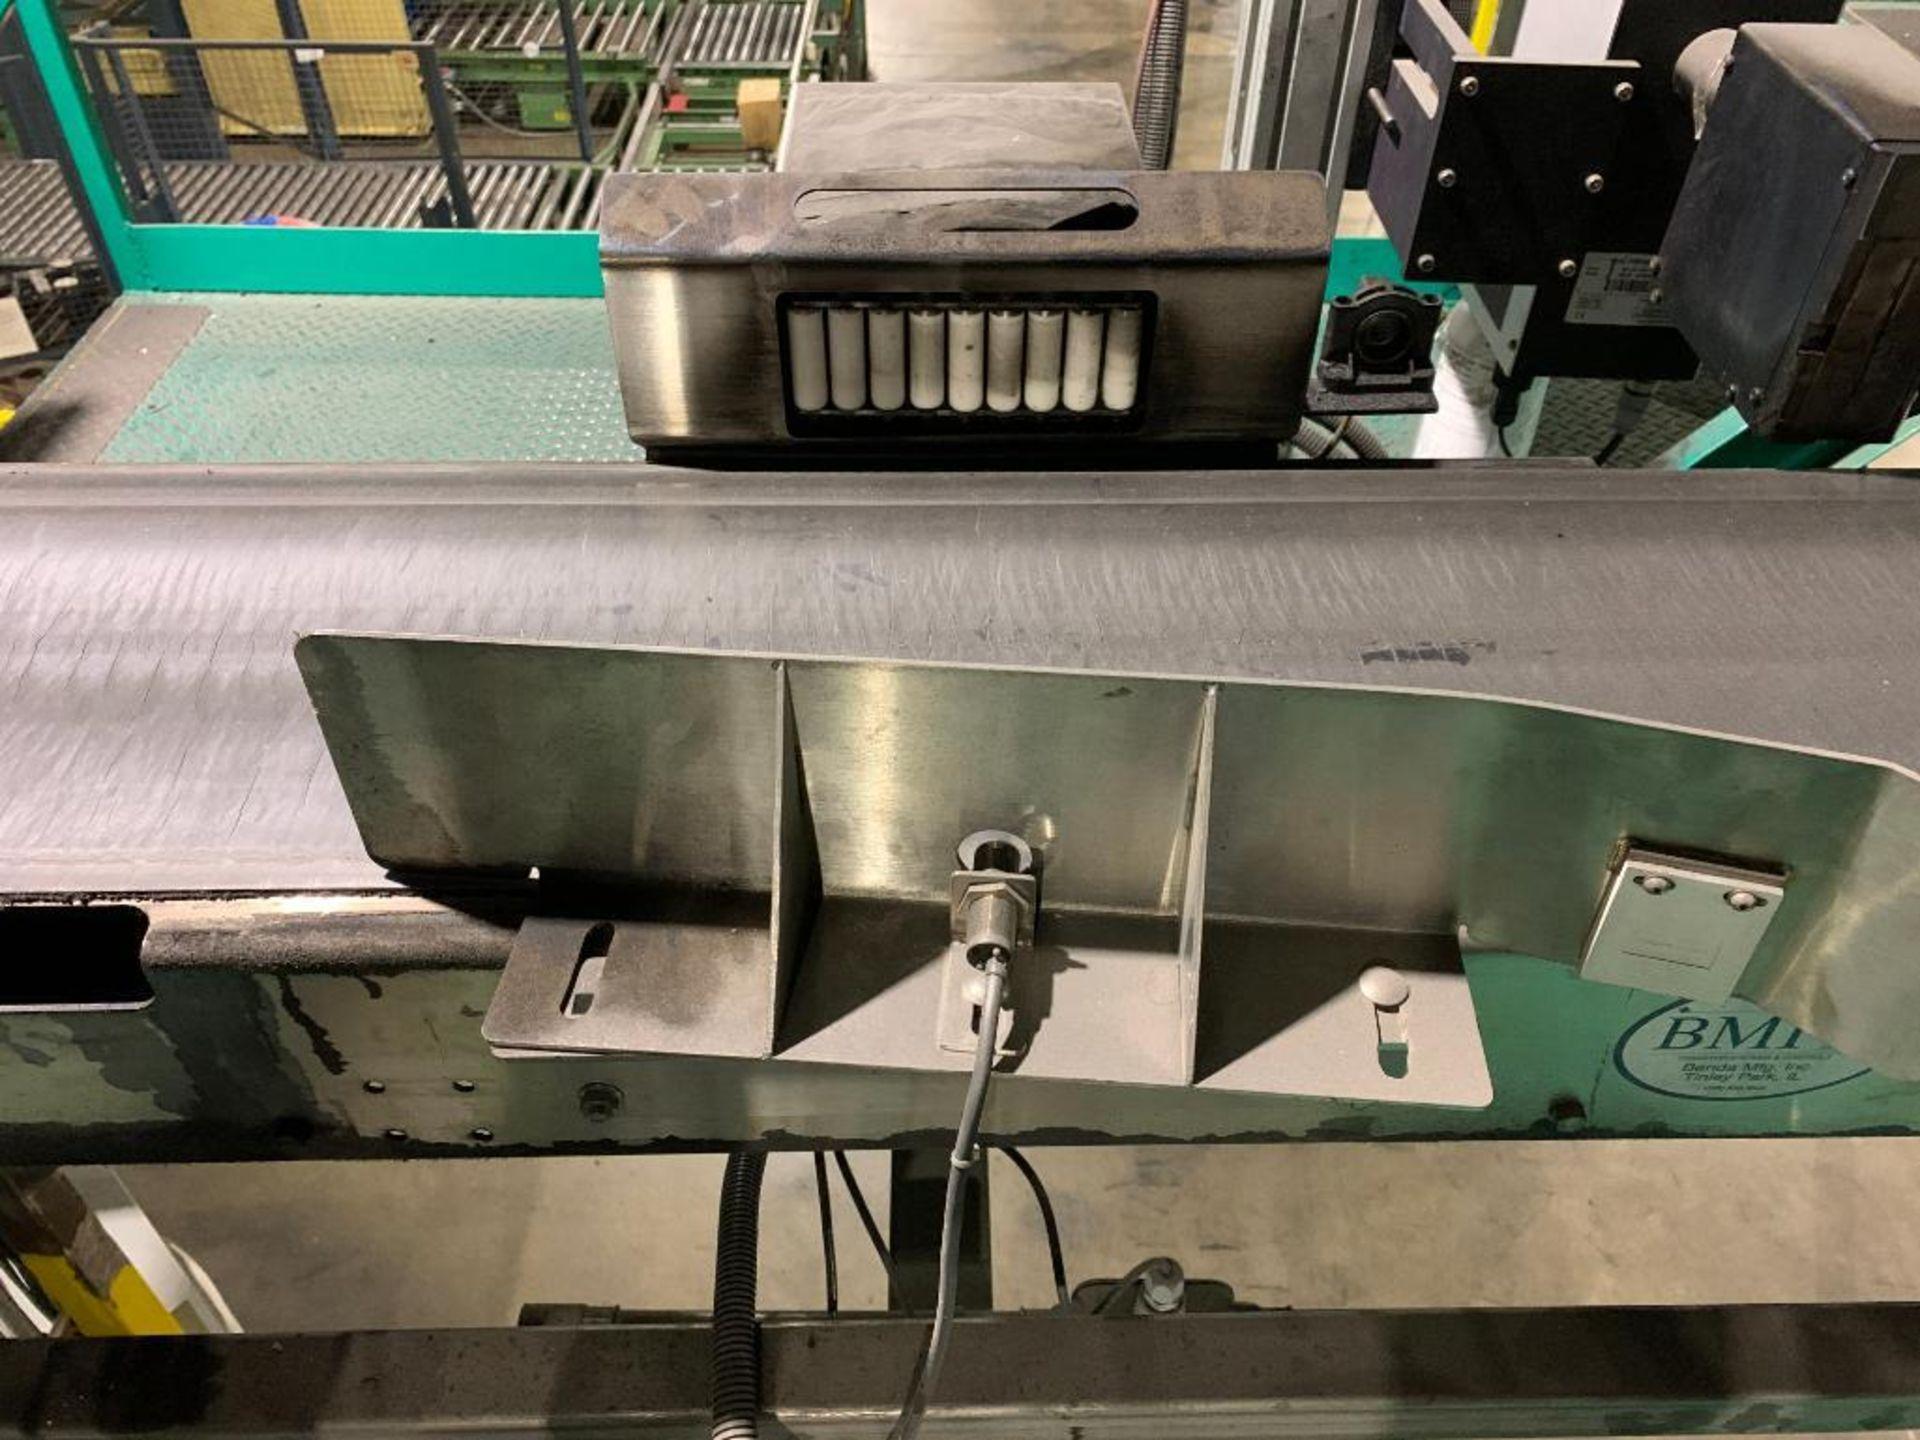 BMI stainless steel conveyor - Image 10 of 14